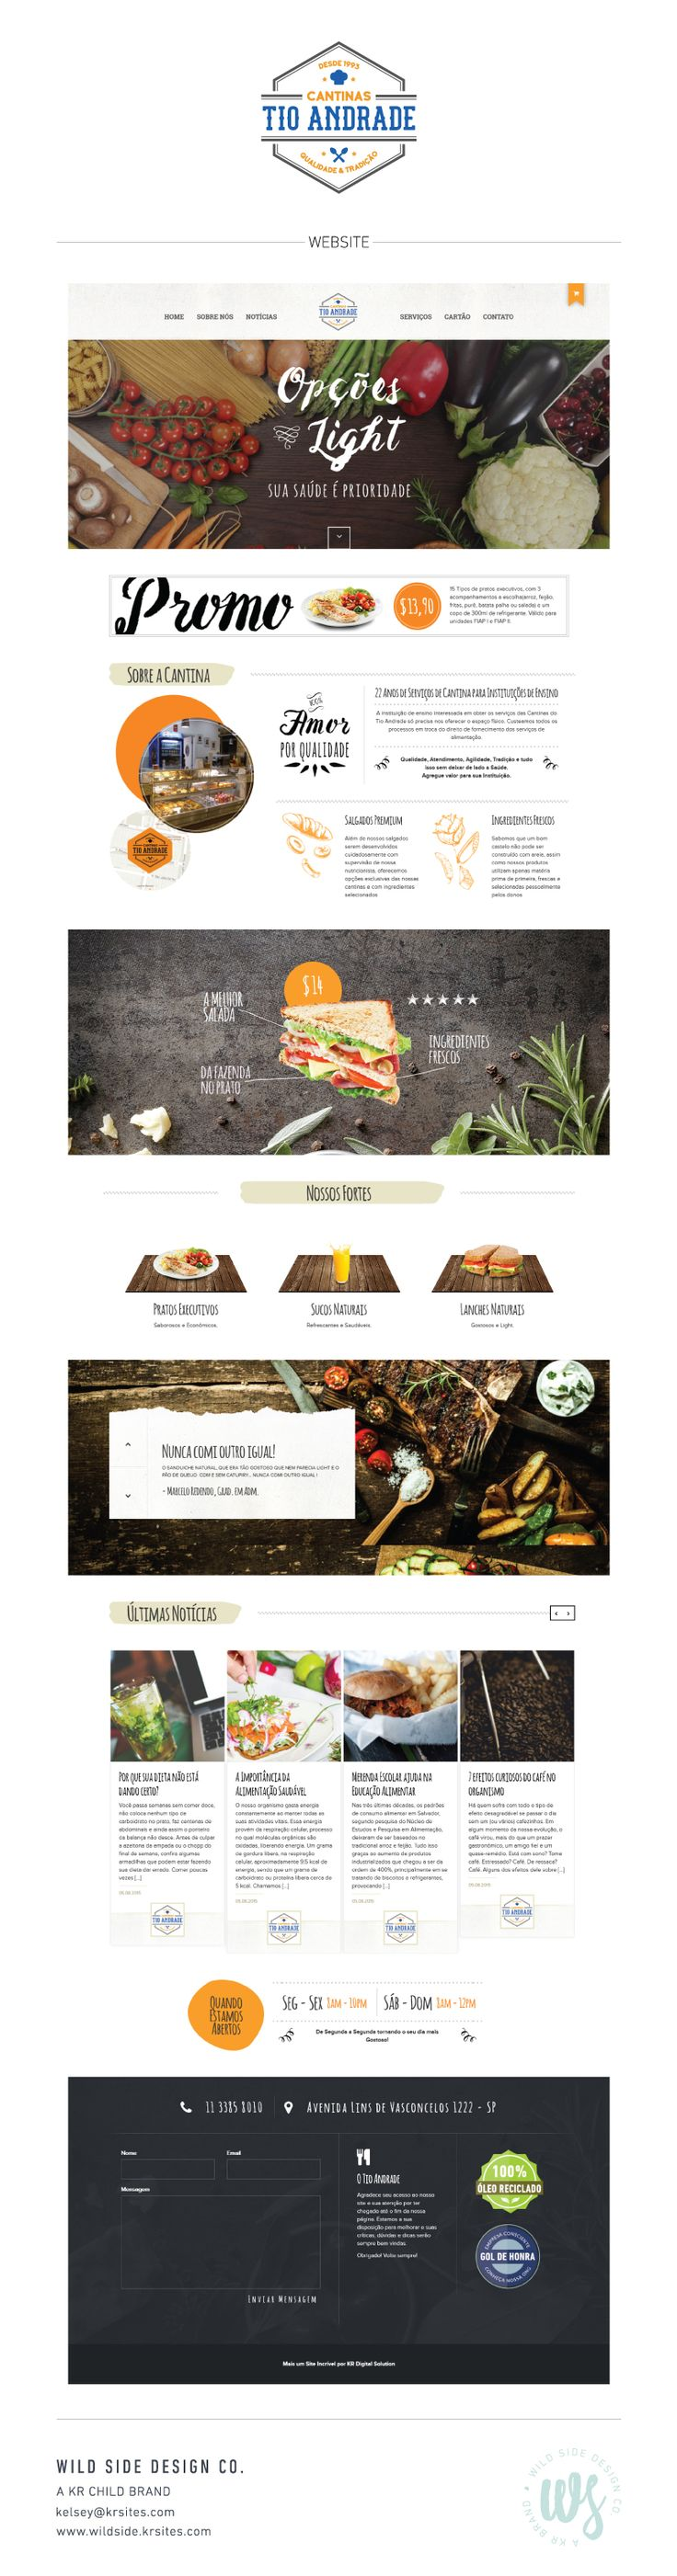 Website Launch | Webdesign | Restaurant Website | Cantinas Tio Andrade Web Design by Wild Side Design Co. | #webdesign www.wildside.krsites.com